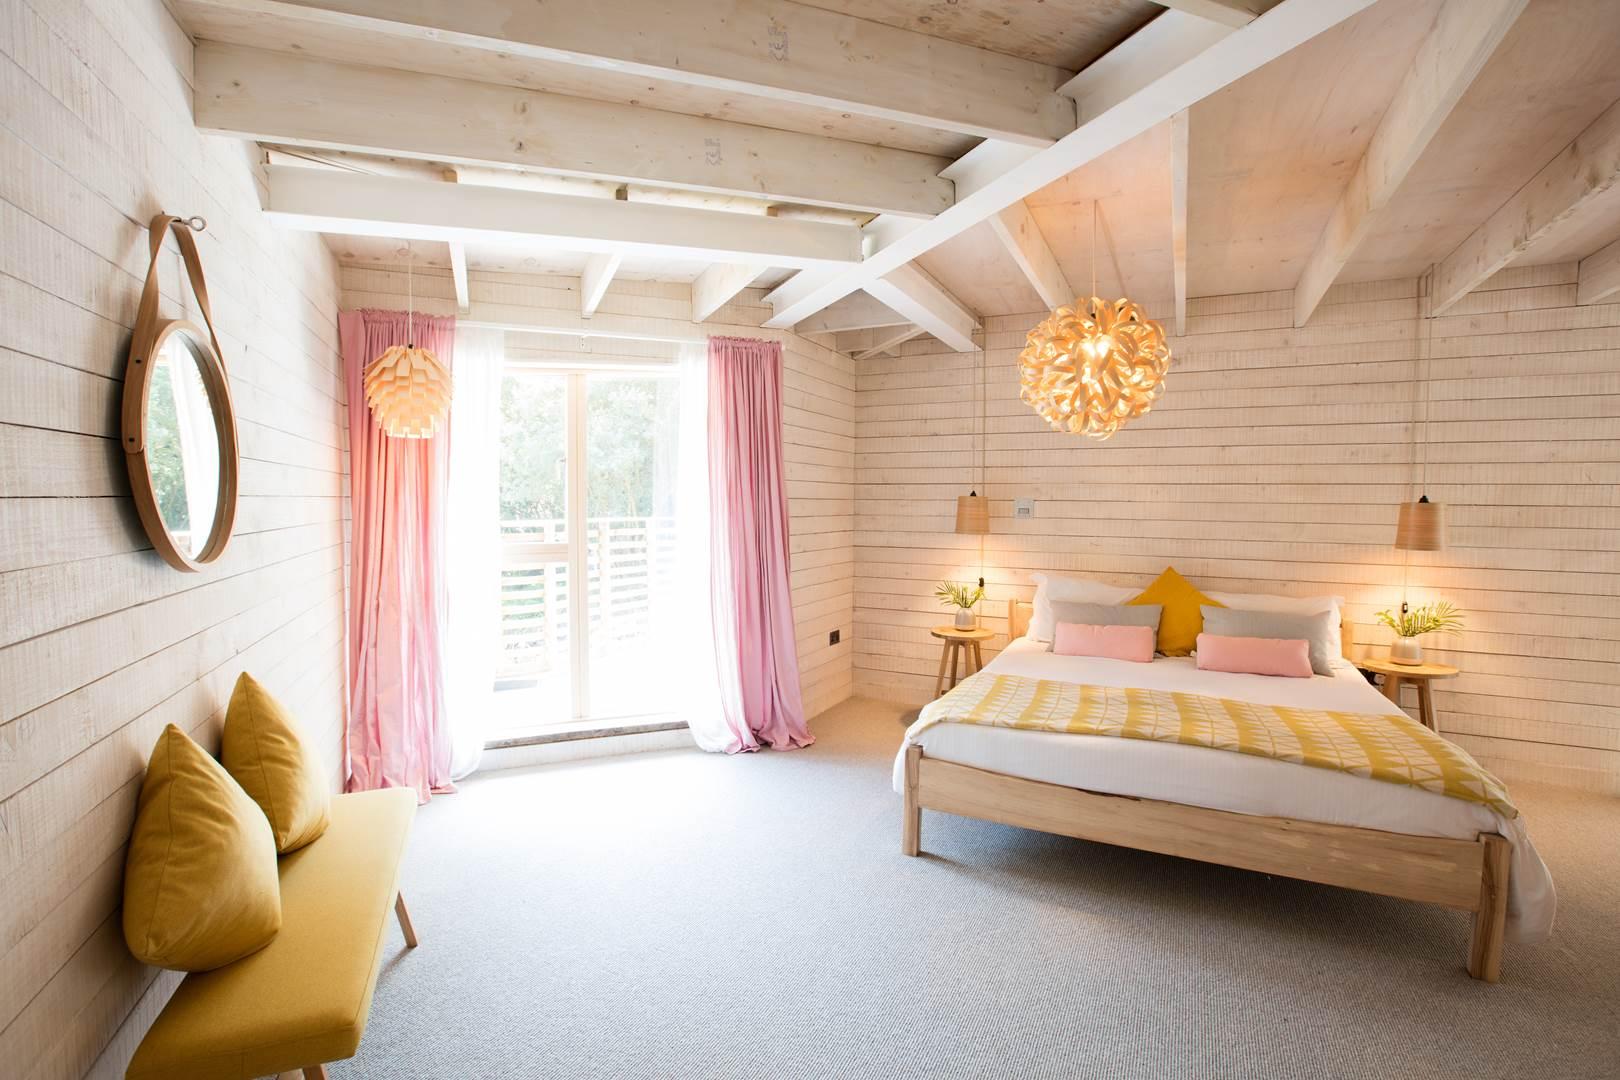 083-tom-raffield-grand-designs-house (Copy)